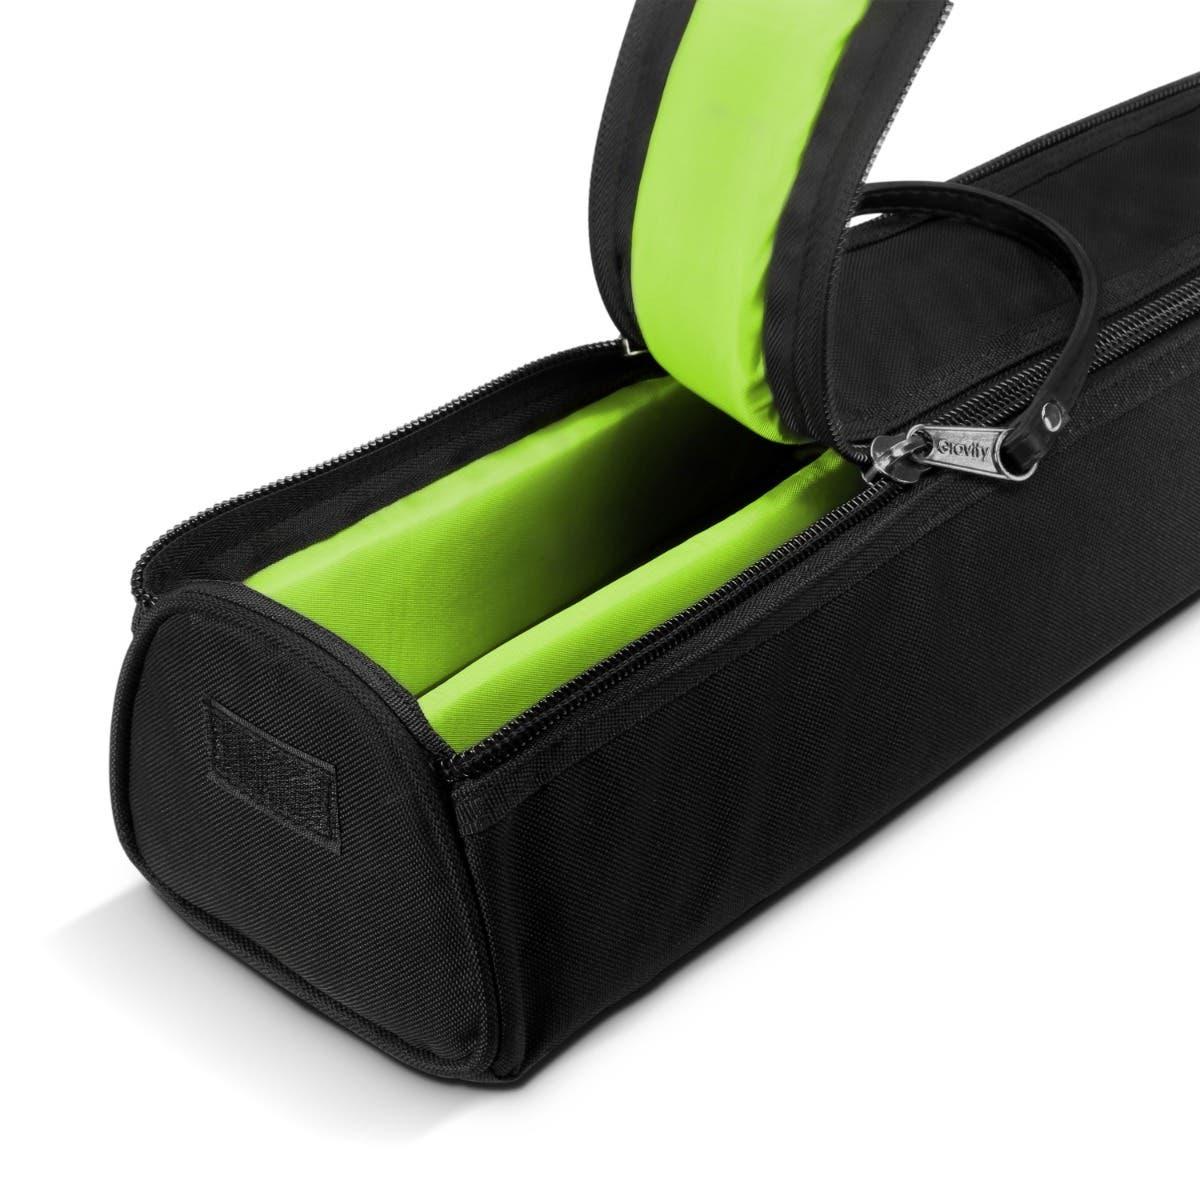 Gravity BGDBLS331 Carry Bag For Distance Poles